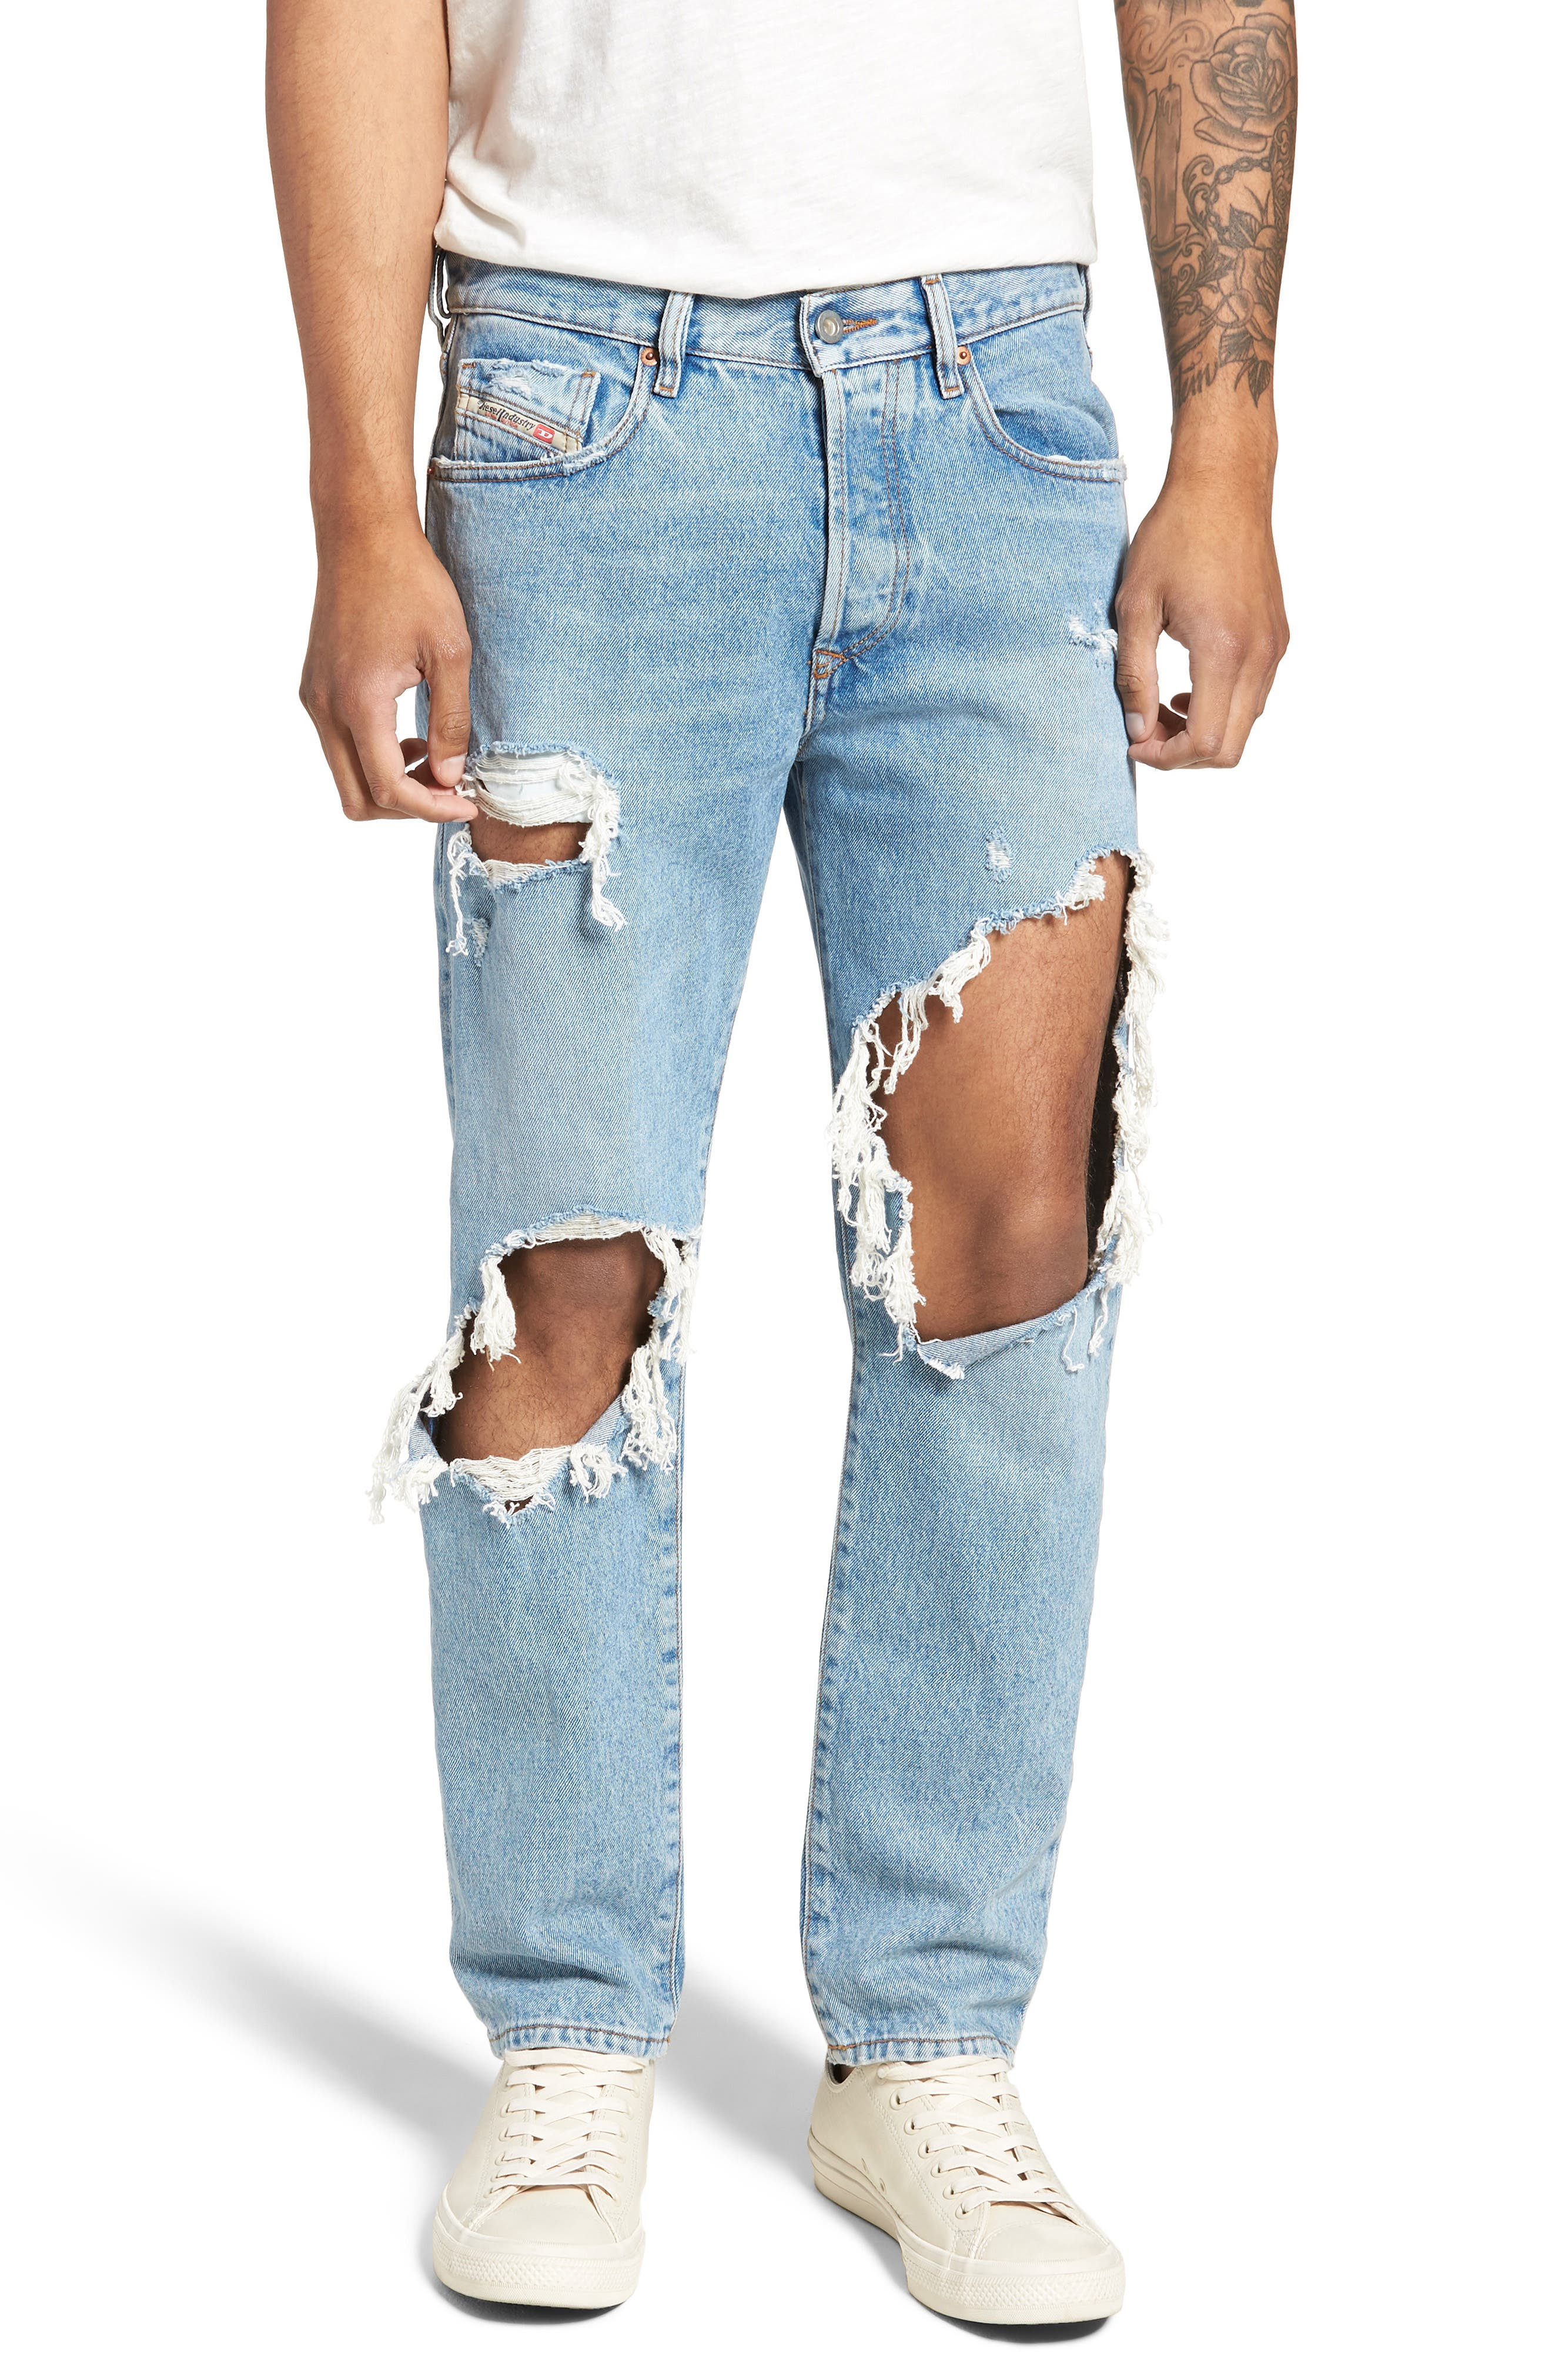 Mharky Slim Straight Leg Jeans,                         Main,                         color, 0076M